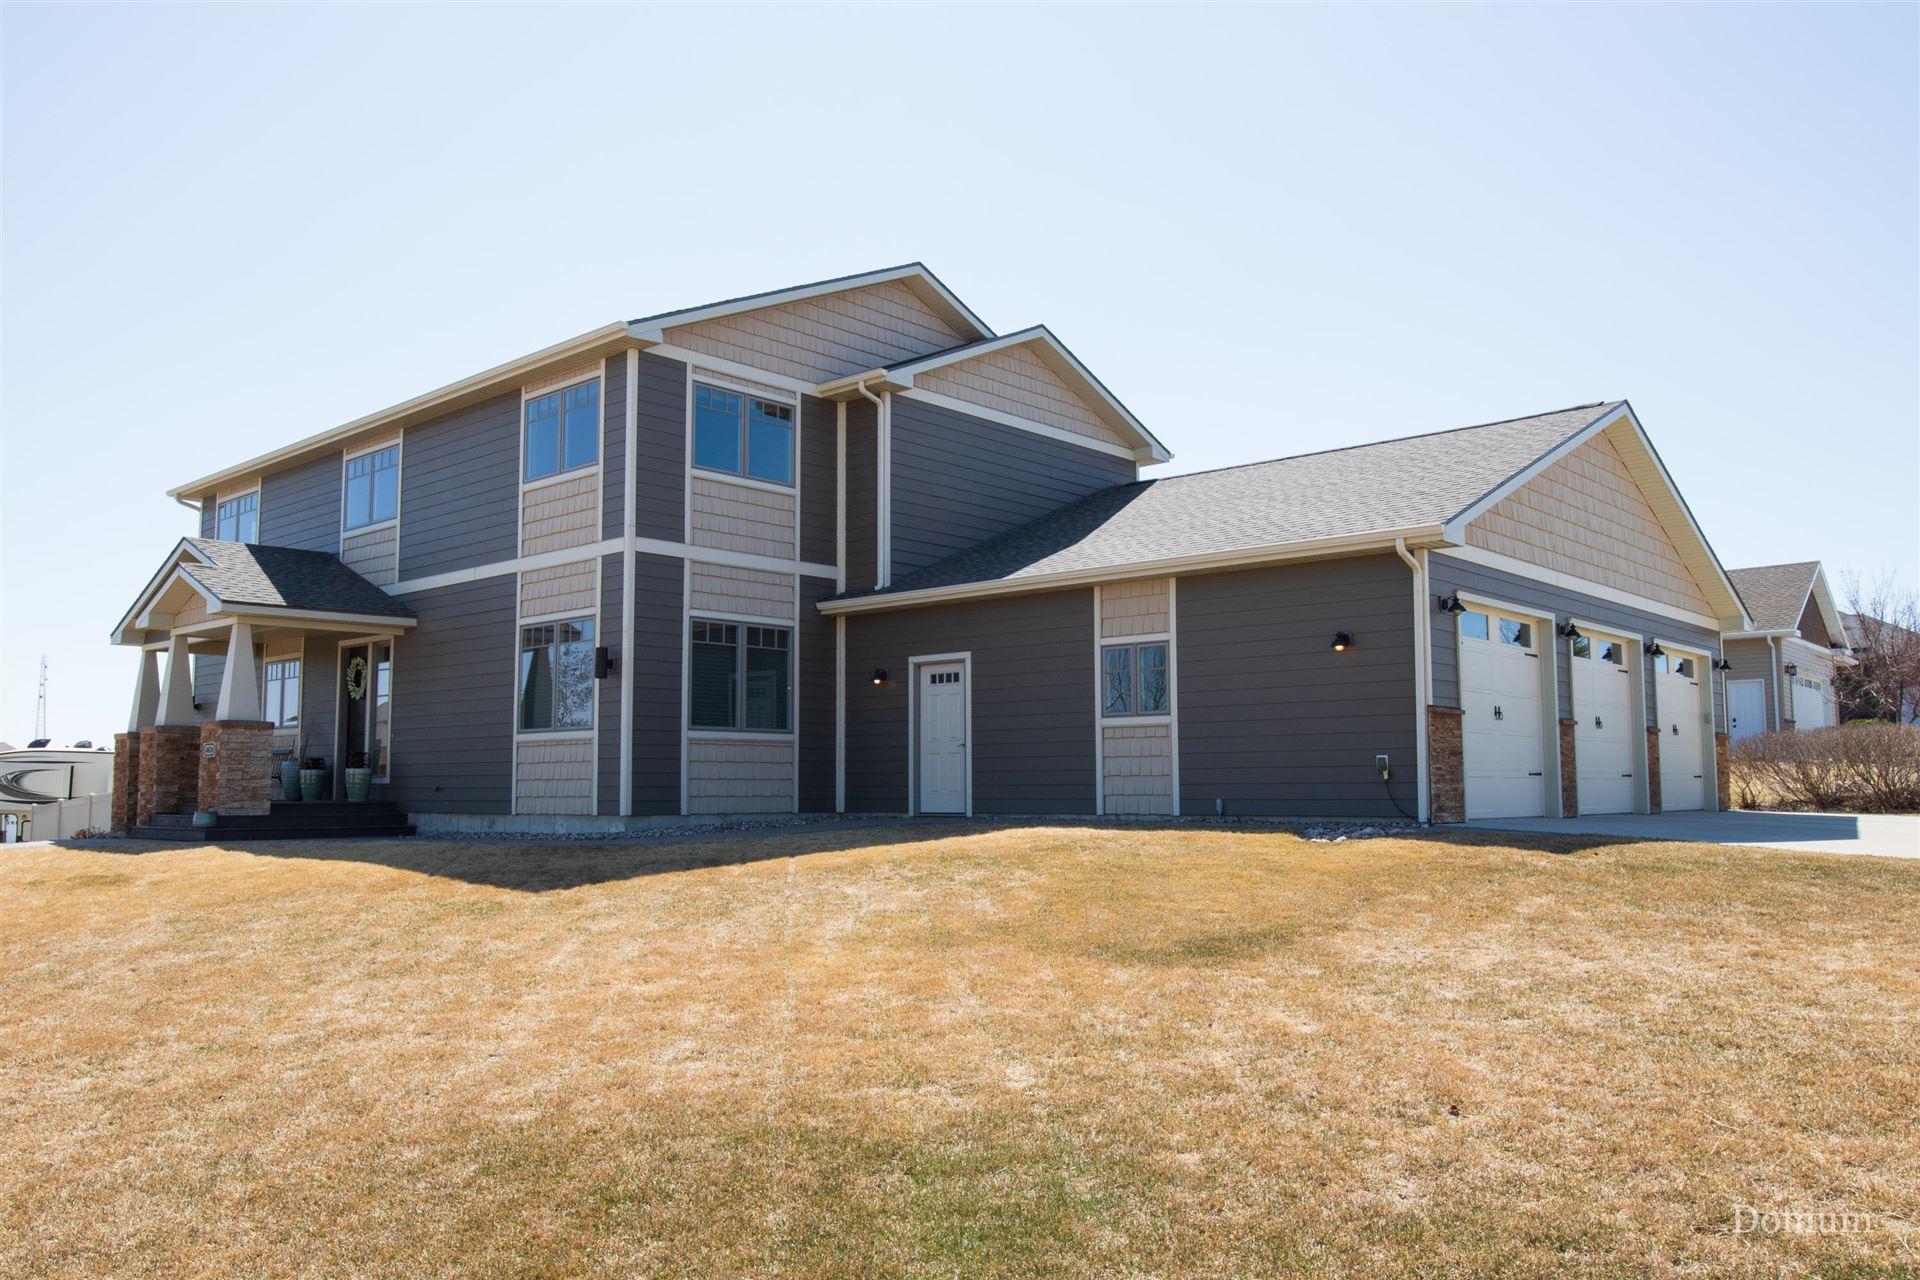 4826 Boulder Ridge Road, Bismarck, ND 58503 - #: 410582